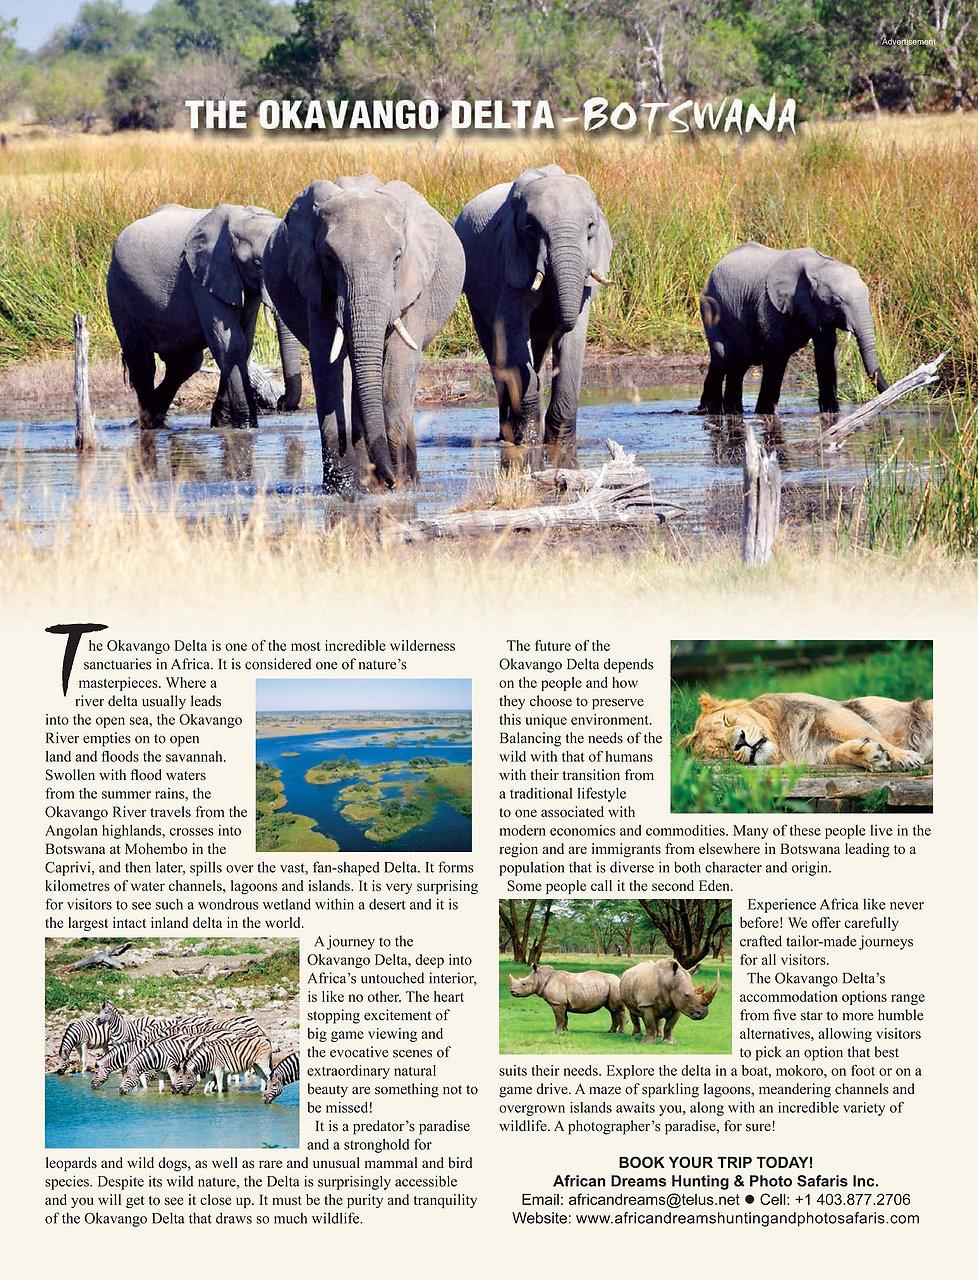 The Okavango Delta Botswana